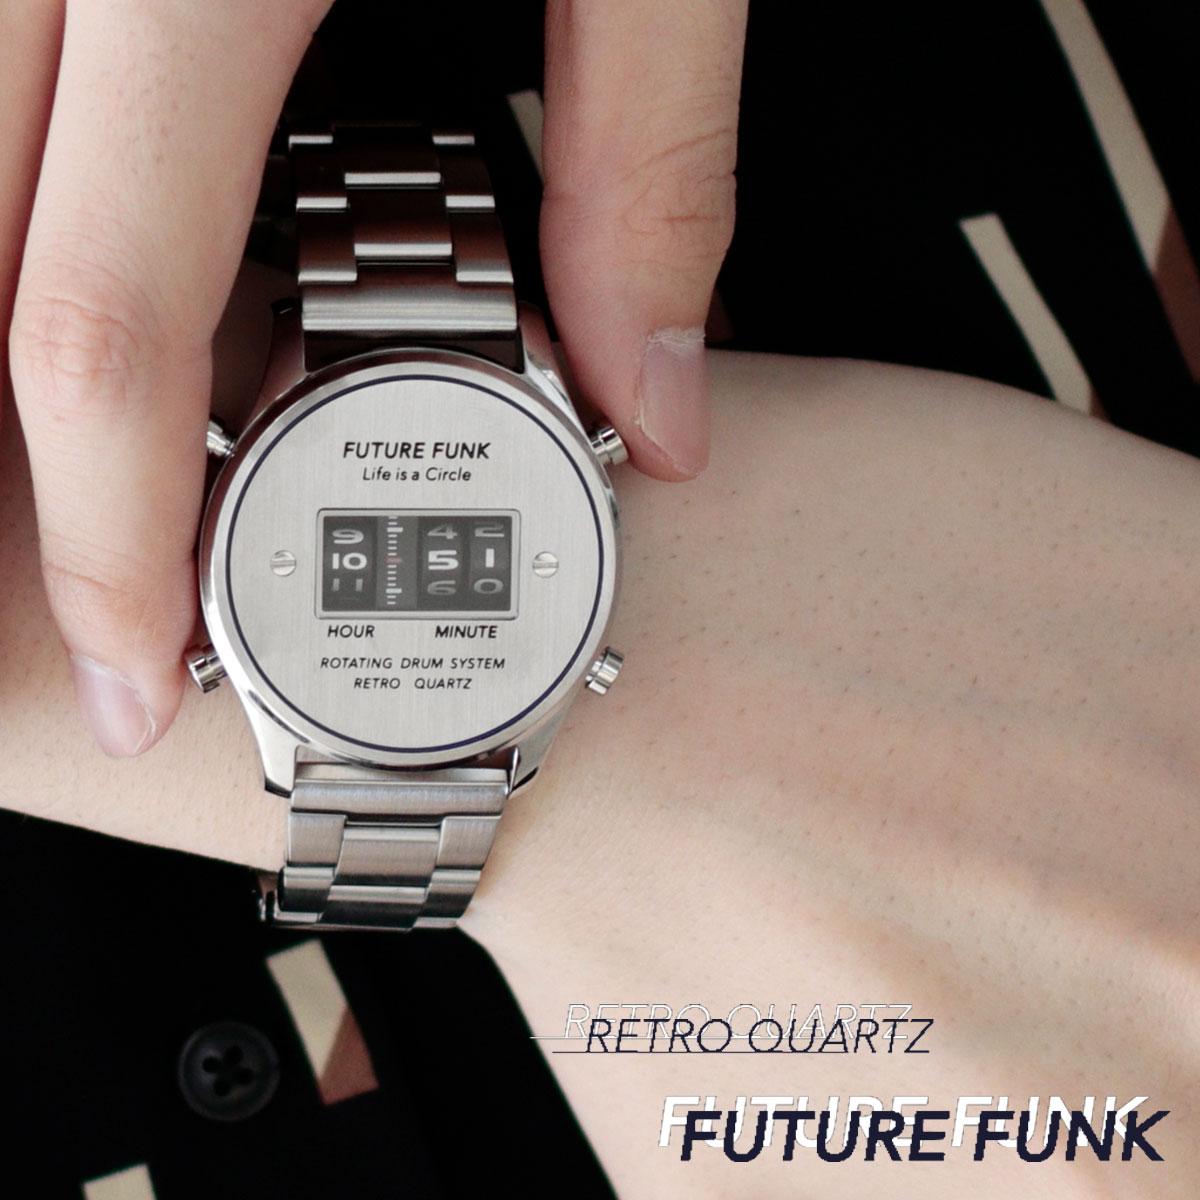 FUTURE FUNK フューチャーファンク FF102-SVBU-MT クオーツ腕時計 メンズ シルバー アナログ デジタル ウォッチ メタルバンド ギフト プレゼント